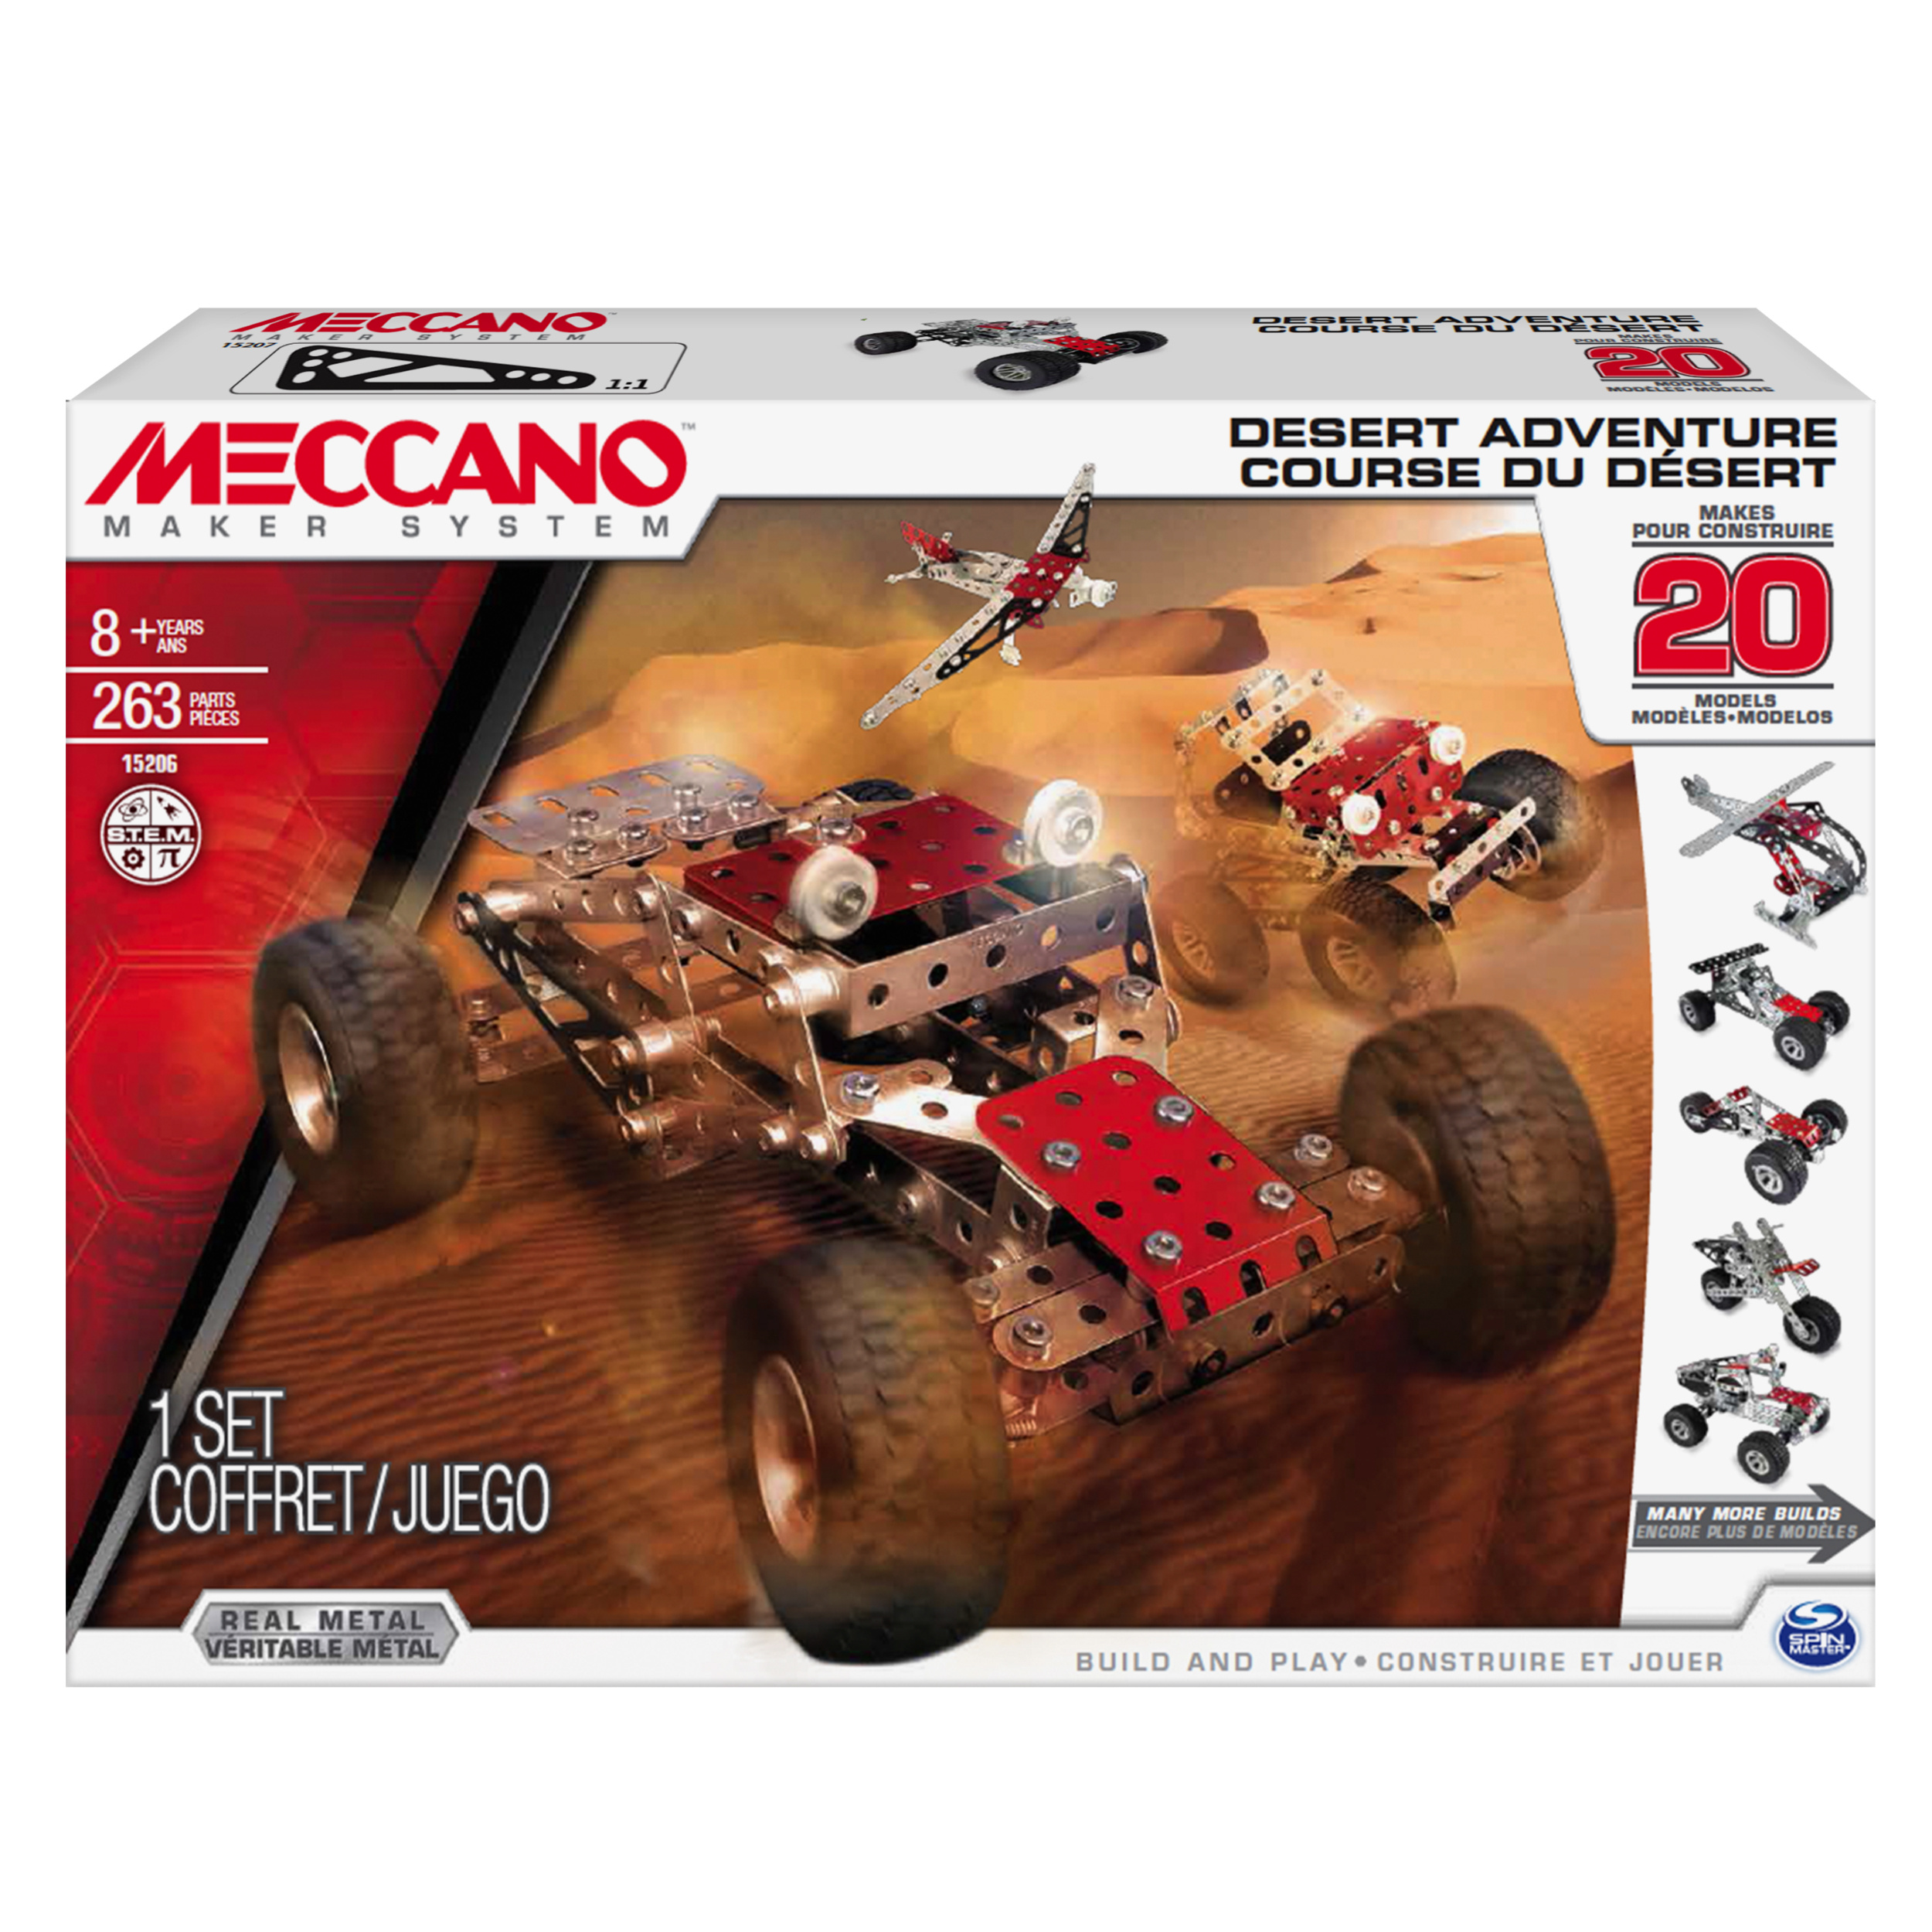 Meccano by Erector, Desert Adventure, 20 Model Building Kit